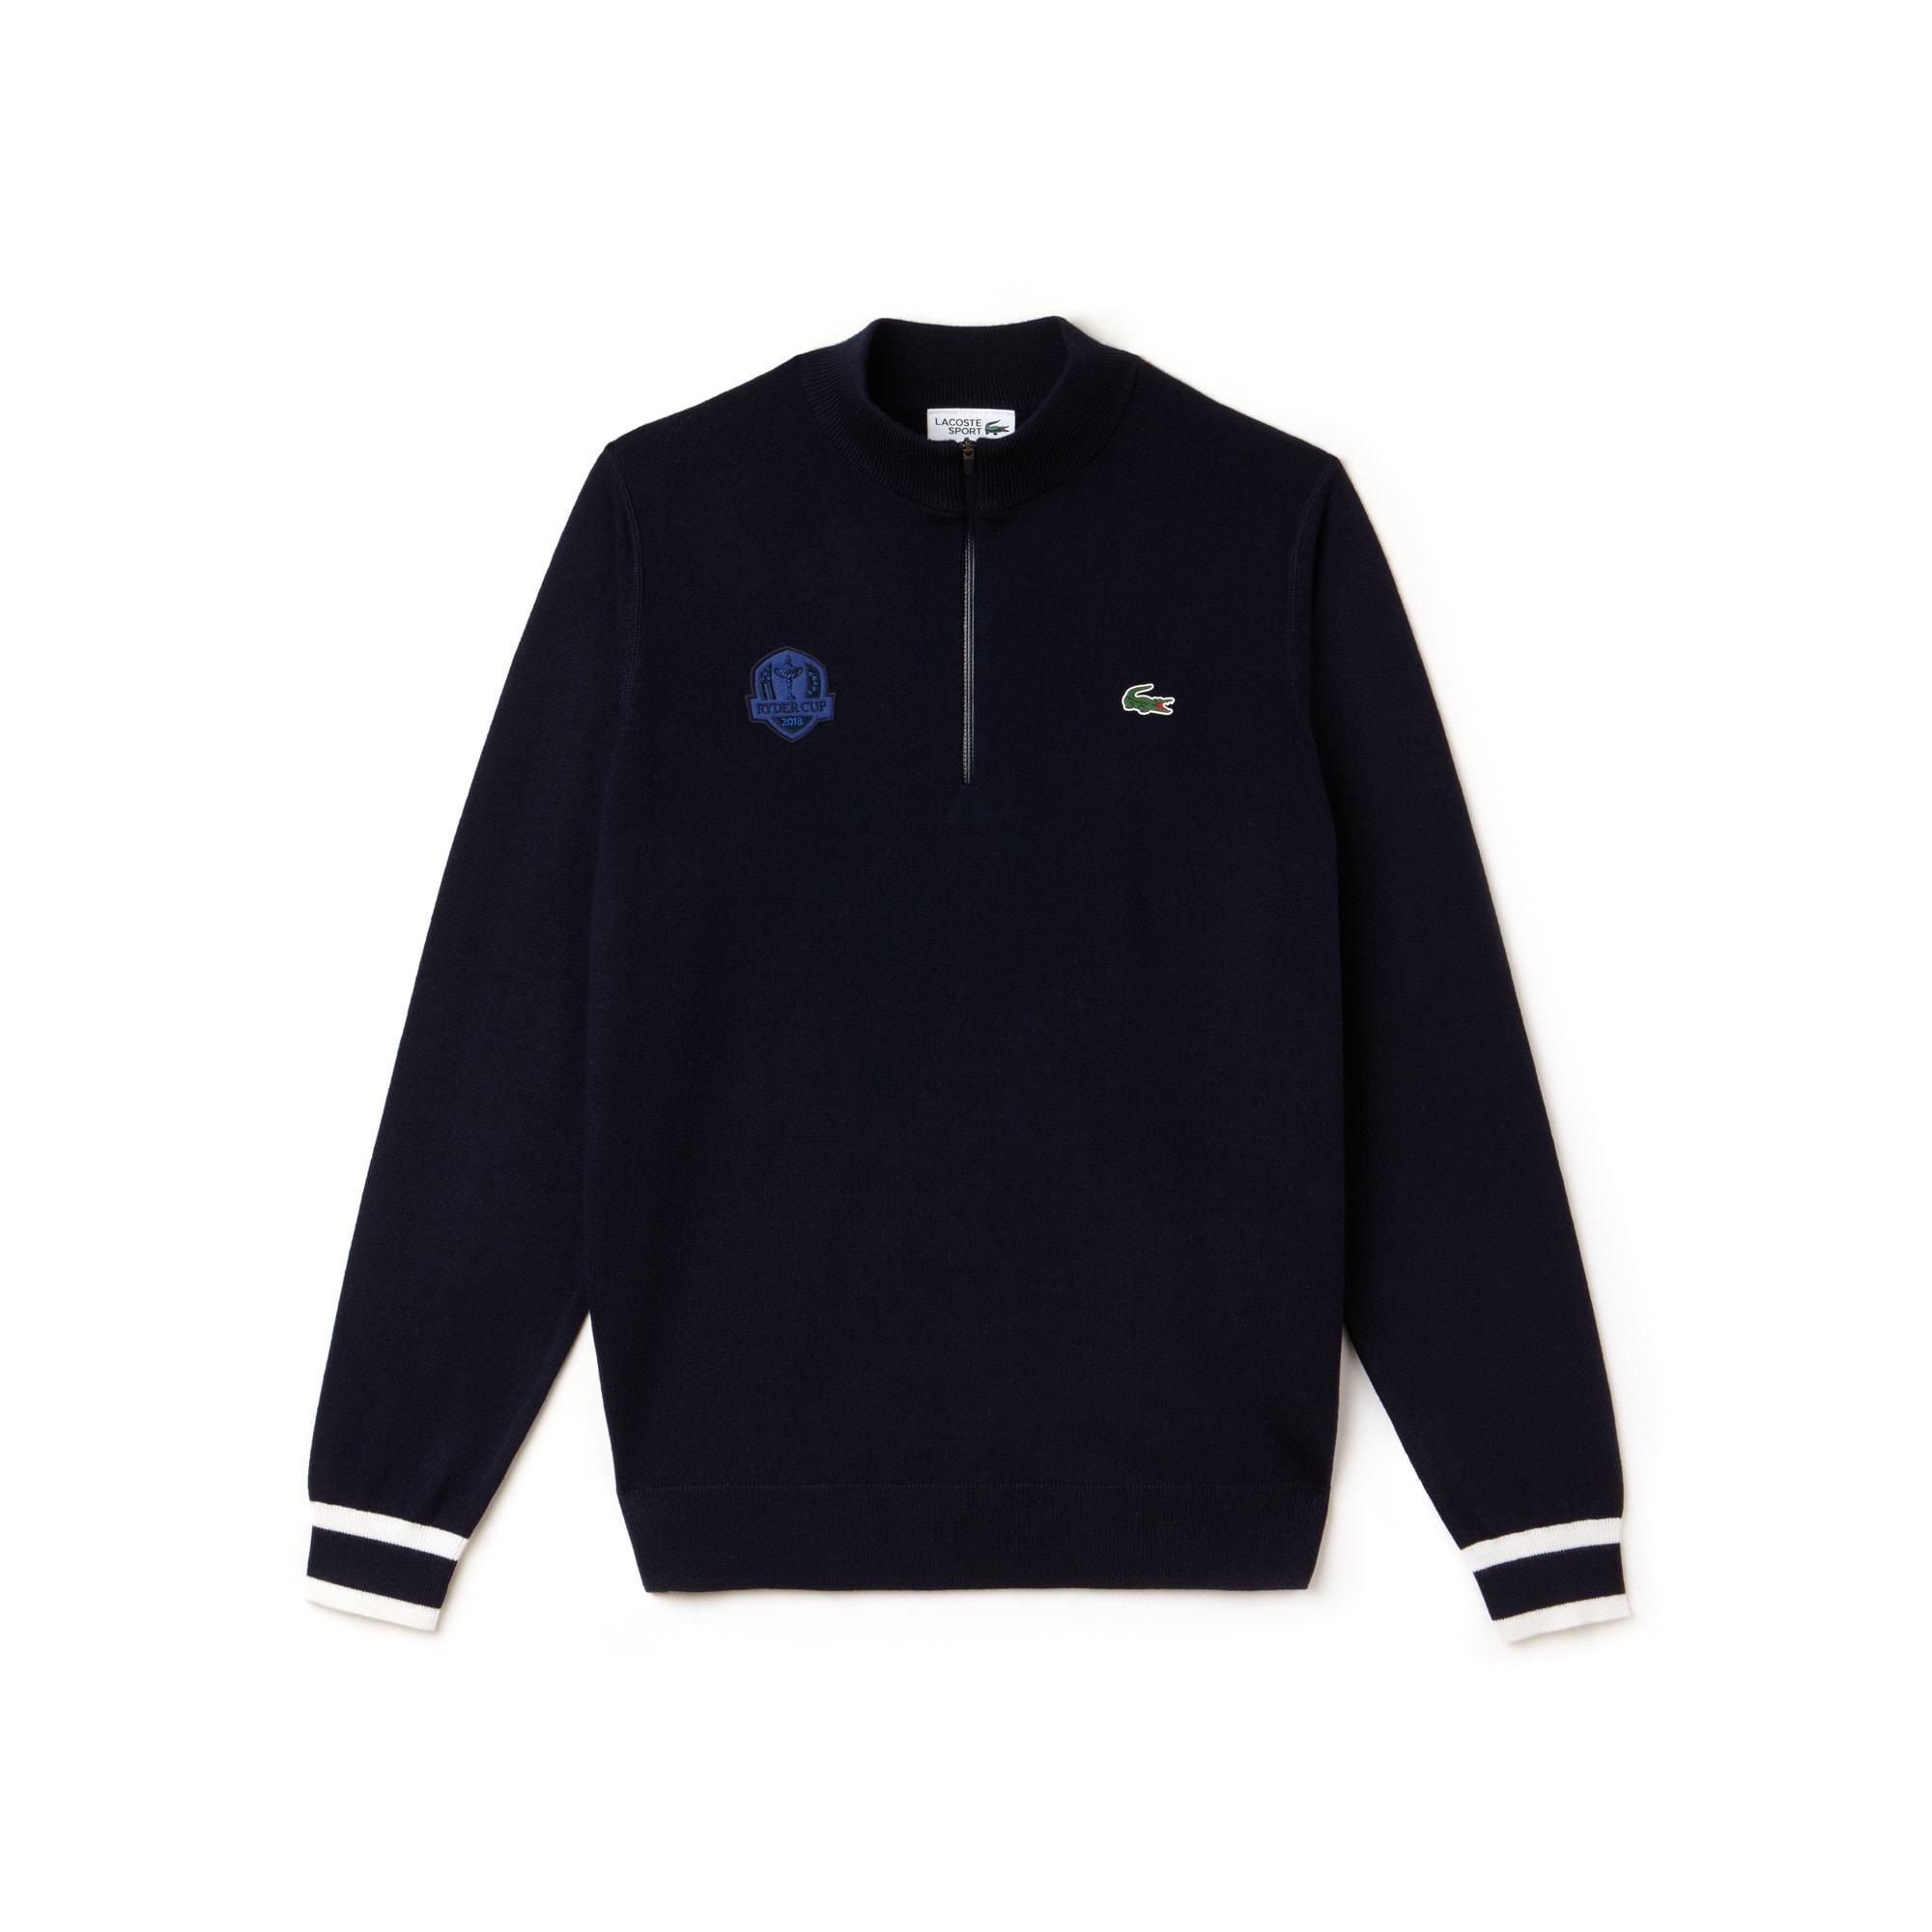 Men's Lacoste SPORT Ryder Cup Edition Zip Neck Jersey Golf Sweater